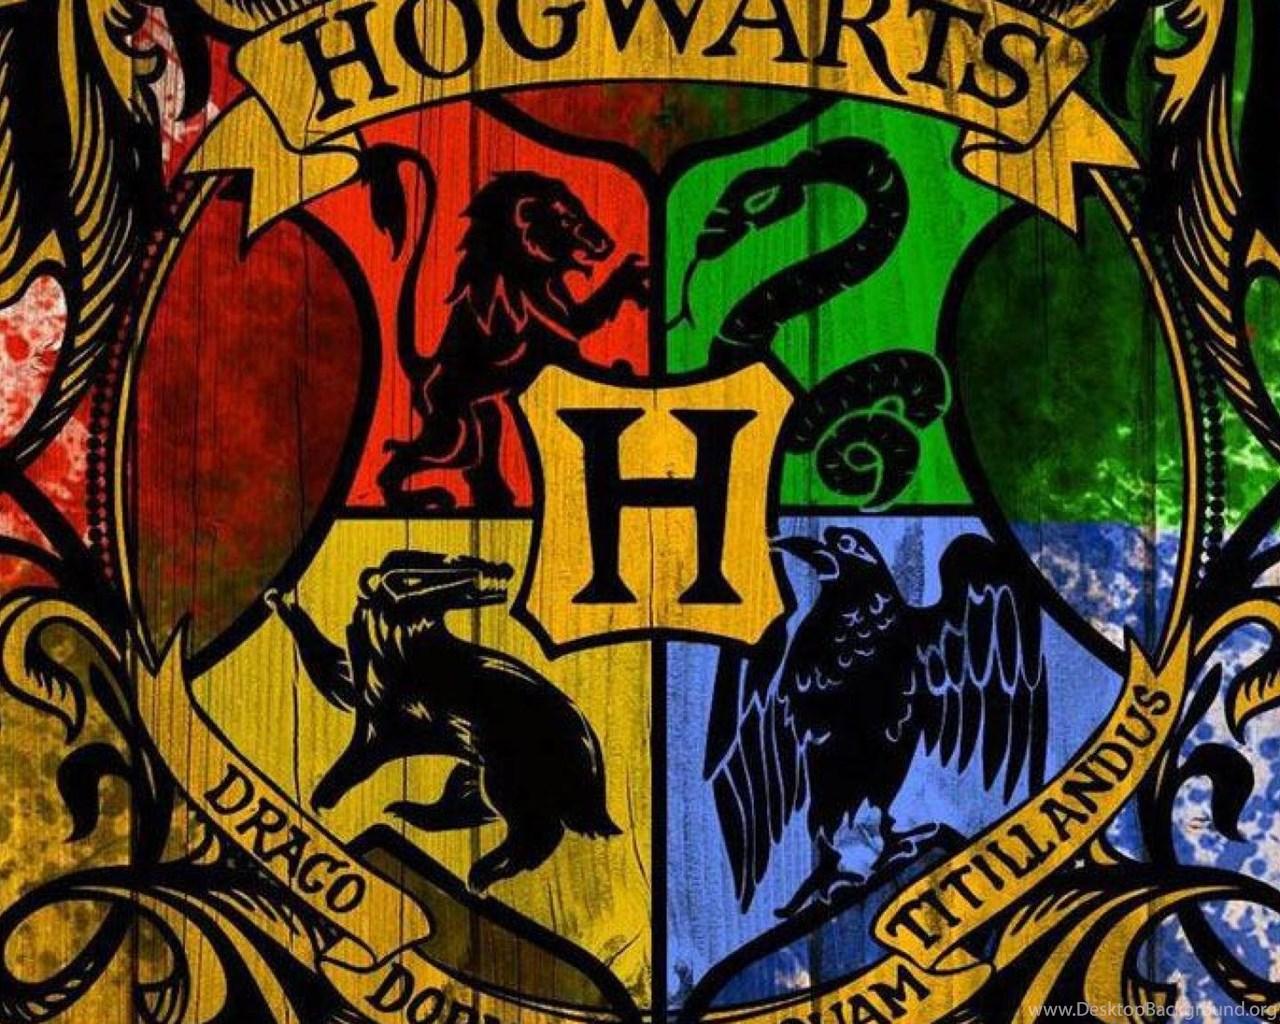 hogwarts logo mobile wallpaper labzada wallpaper